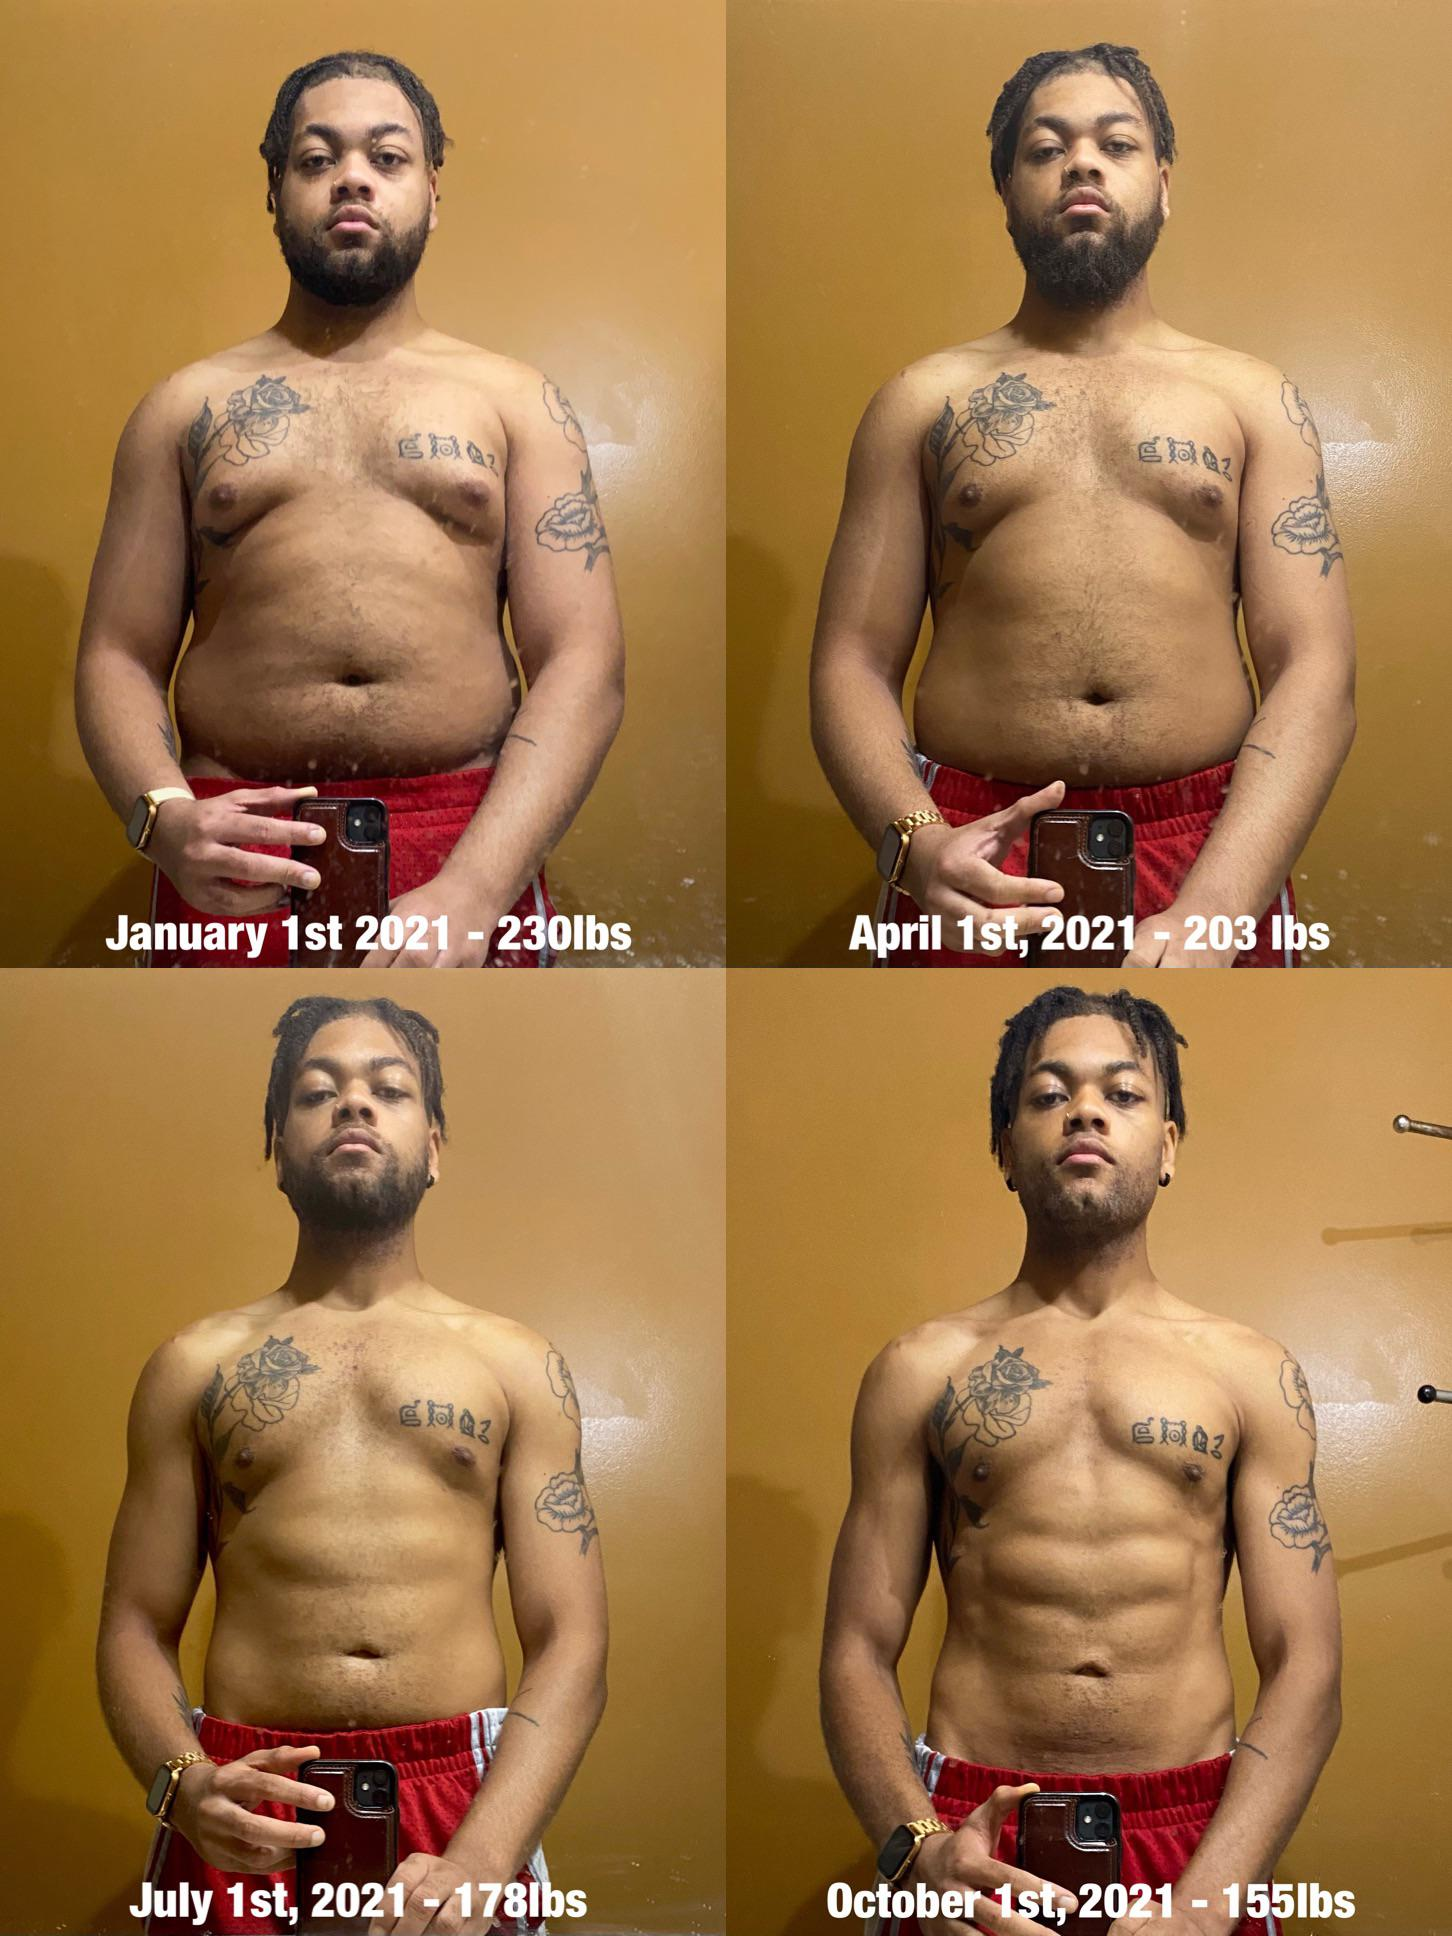 6 foot Male 75 lbs Weight Loss 230 lbs to 155 lbs